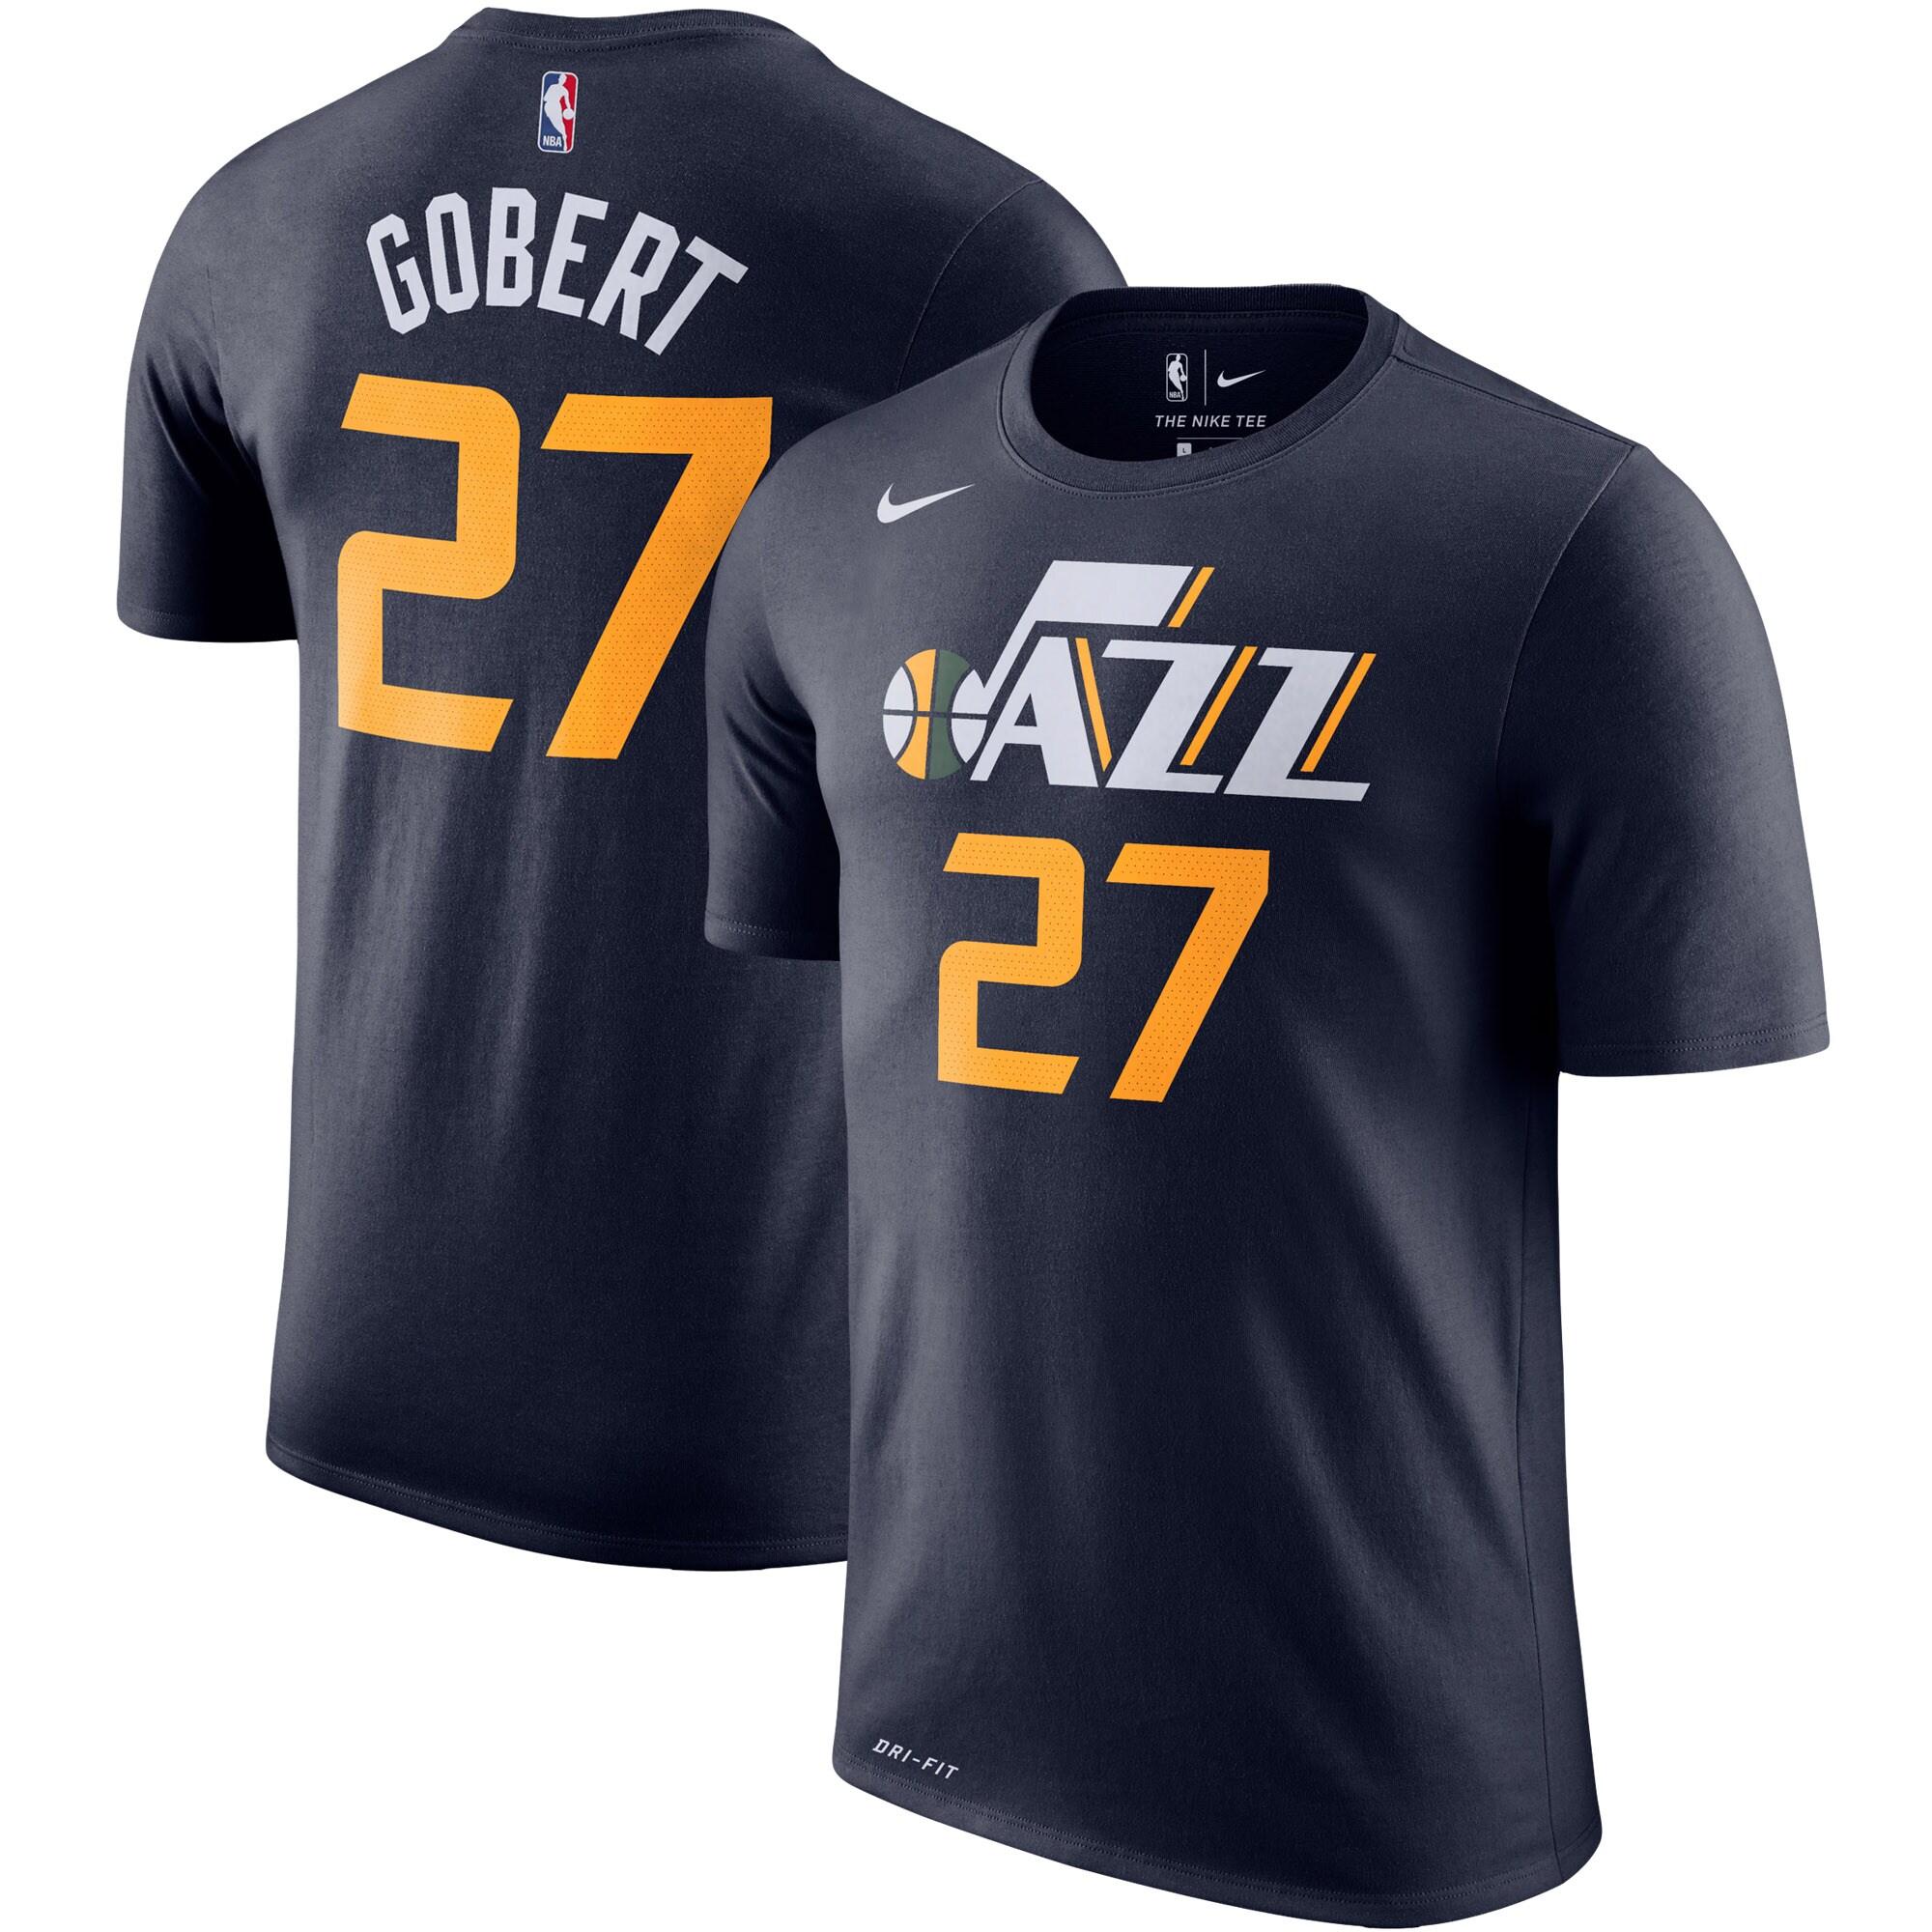 Rudy Gobert Utah Jazz Nike Player Name & Number Performance T-Shirt - Navy